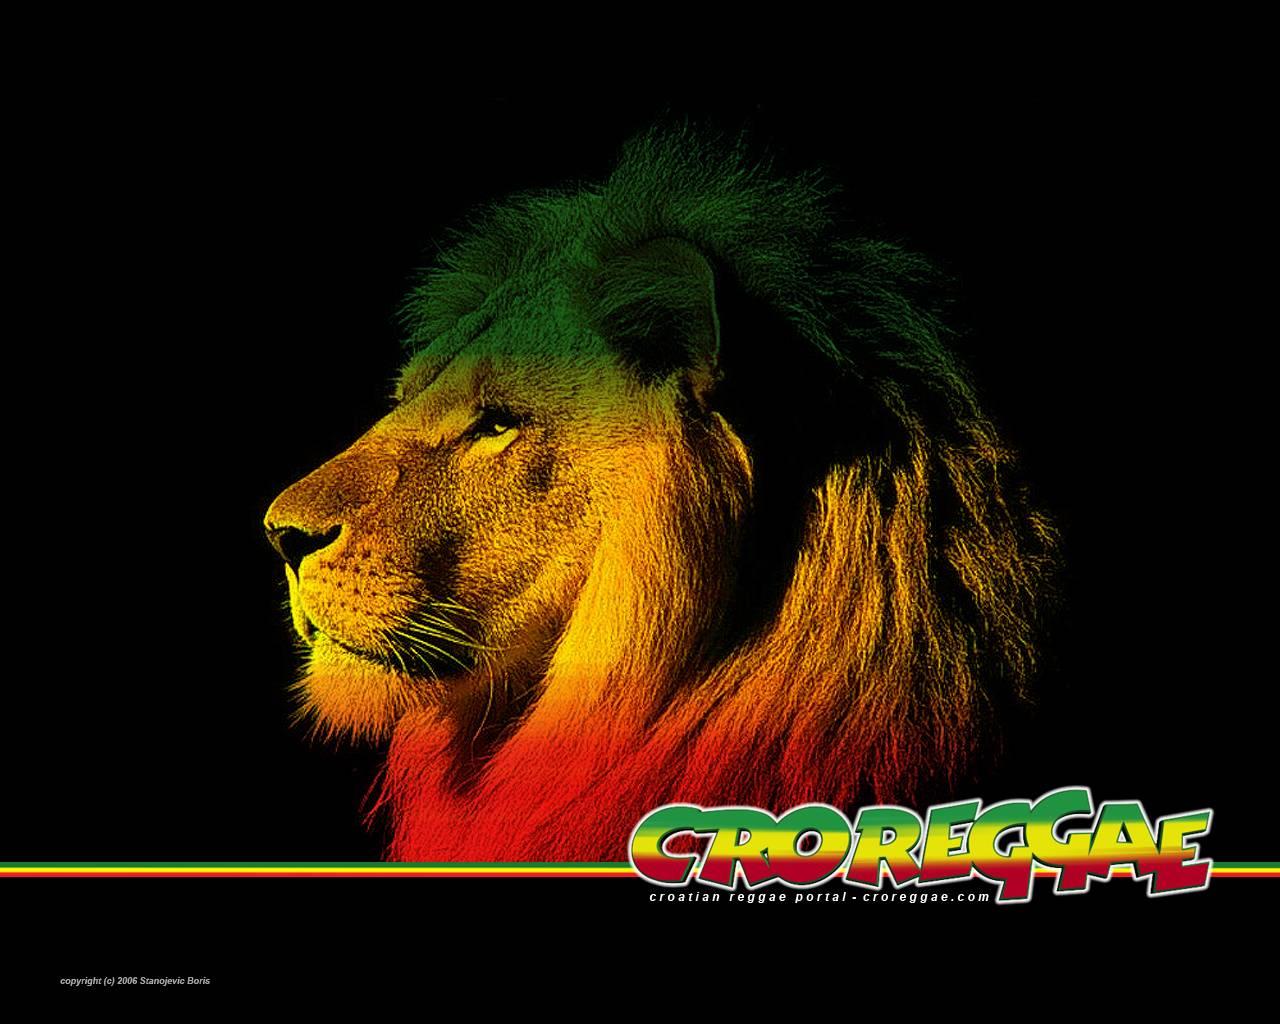 rastafarian lion wallpaper - photo #1